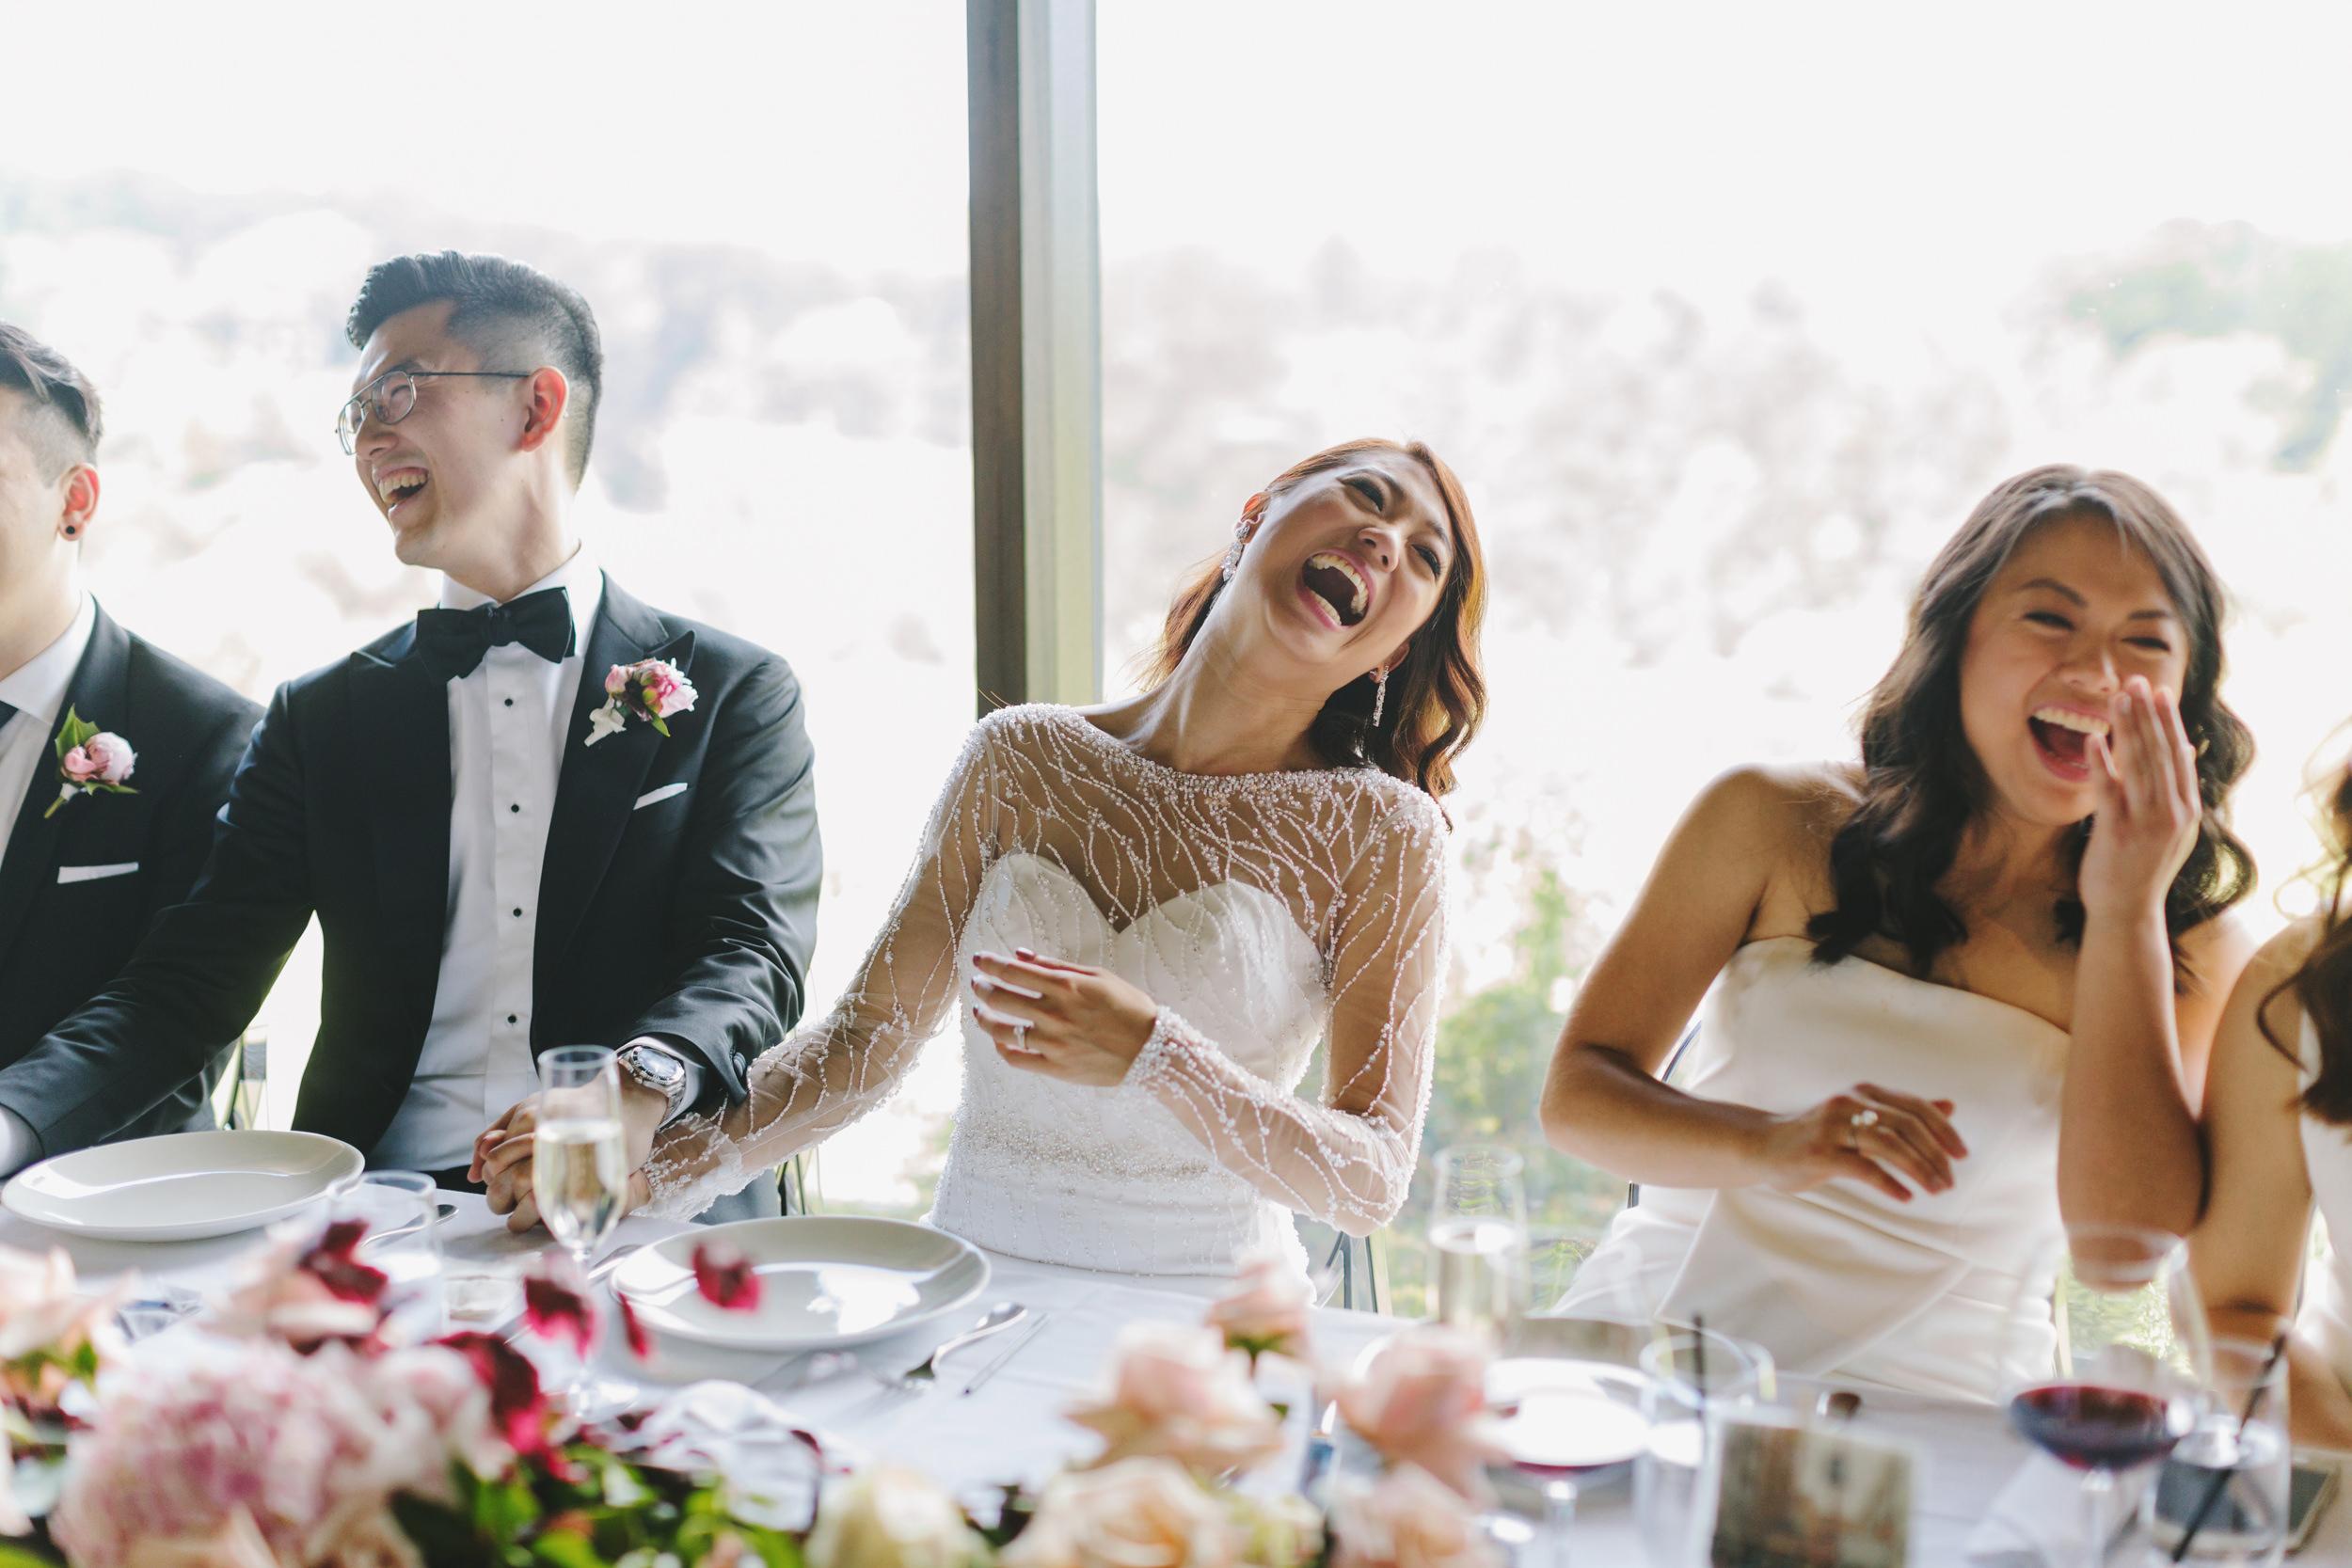 Melbourne Winery Wedding Daryl & Adeline 74.JPG